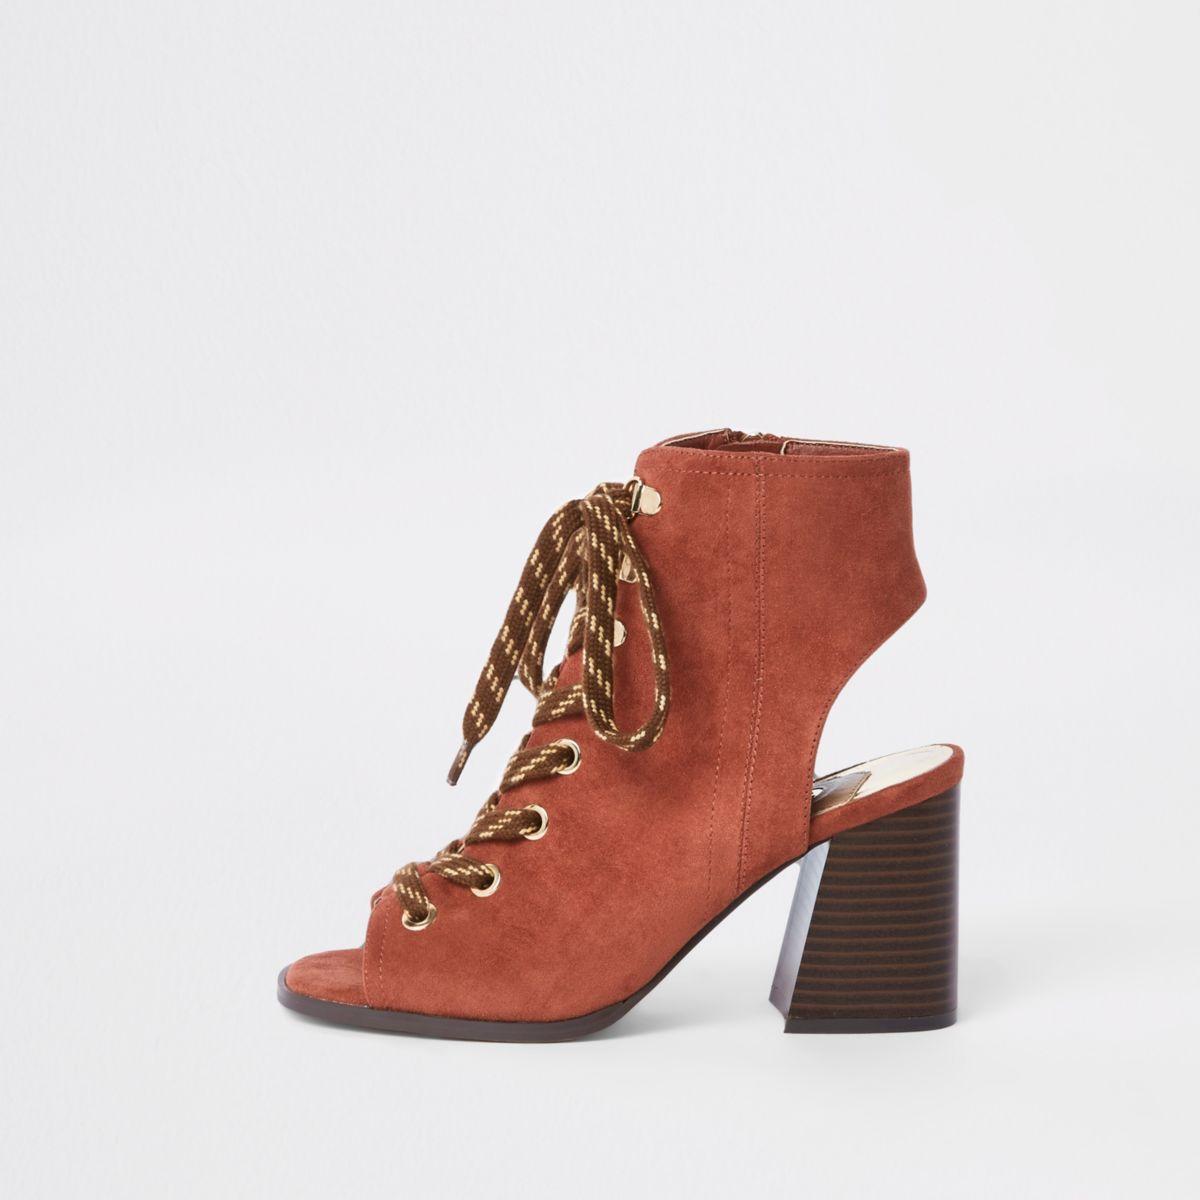 Orange lace-up block heel shoe boots